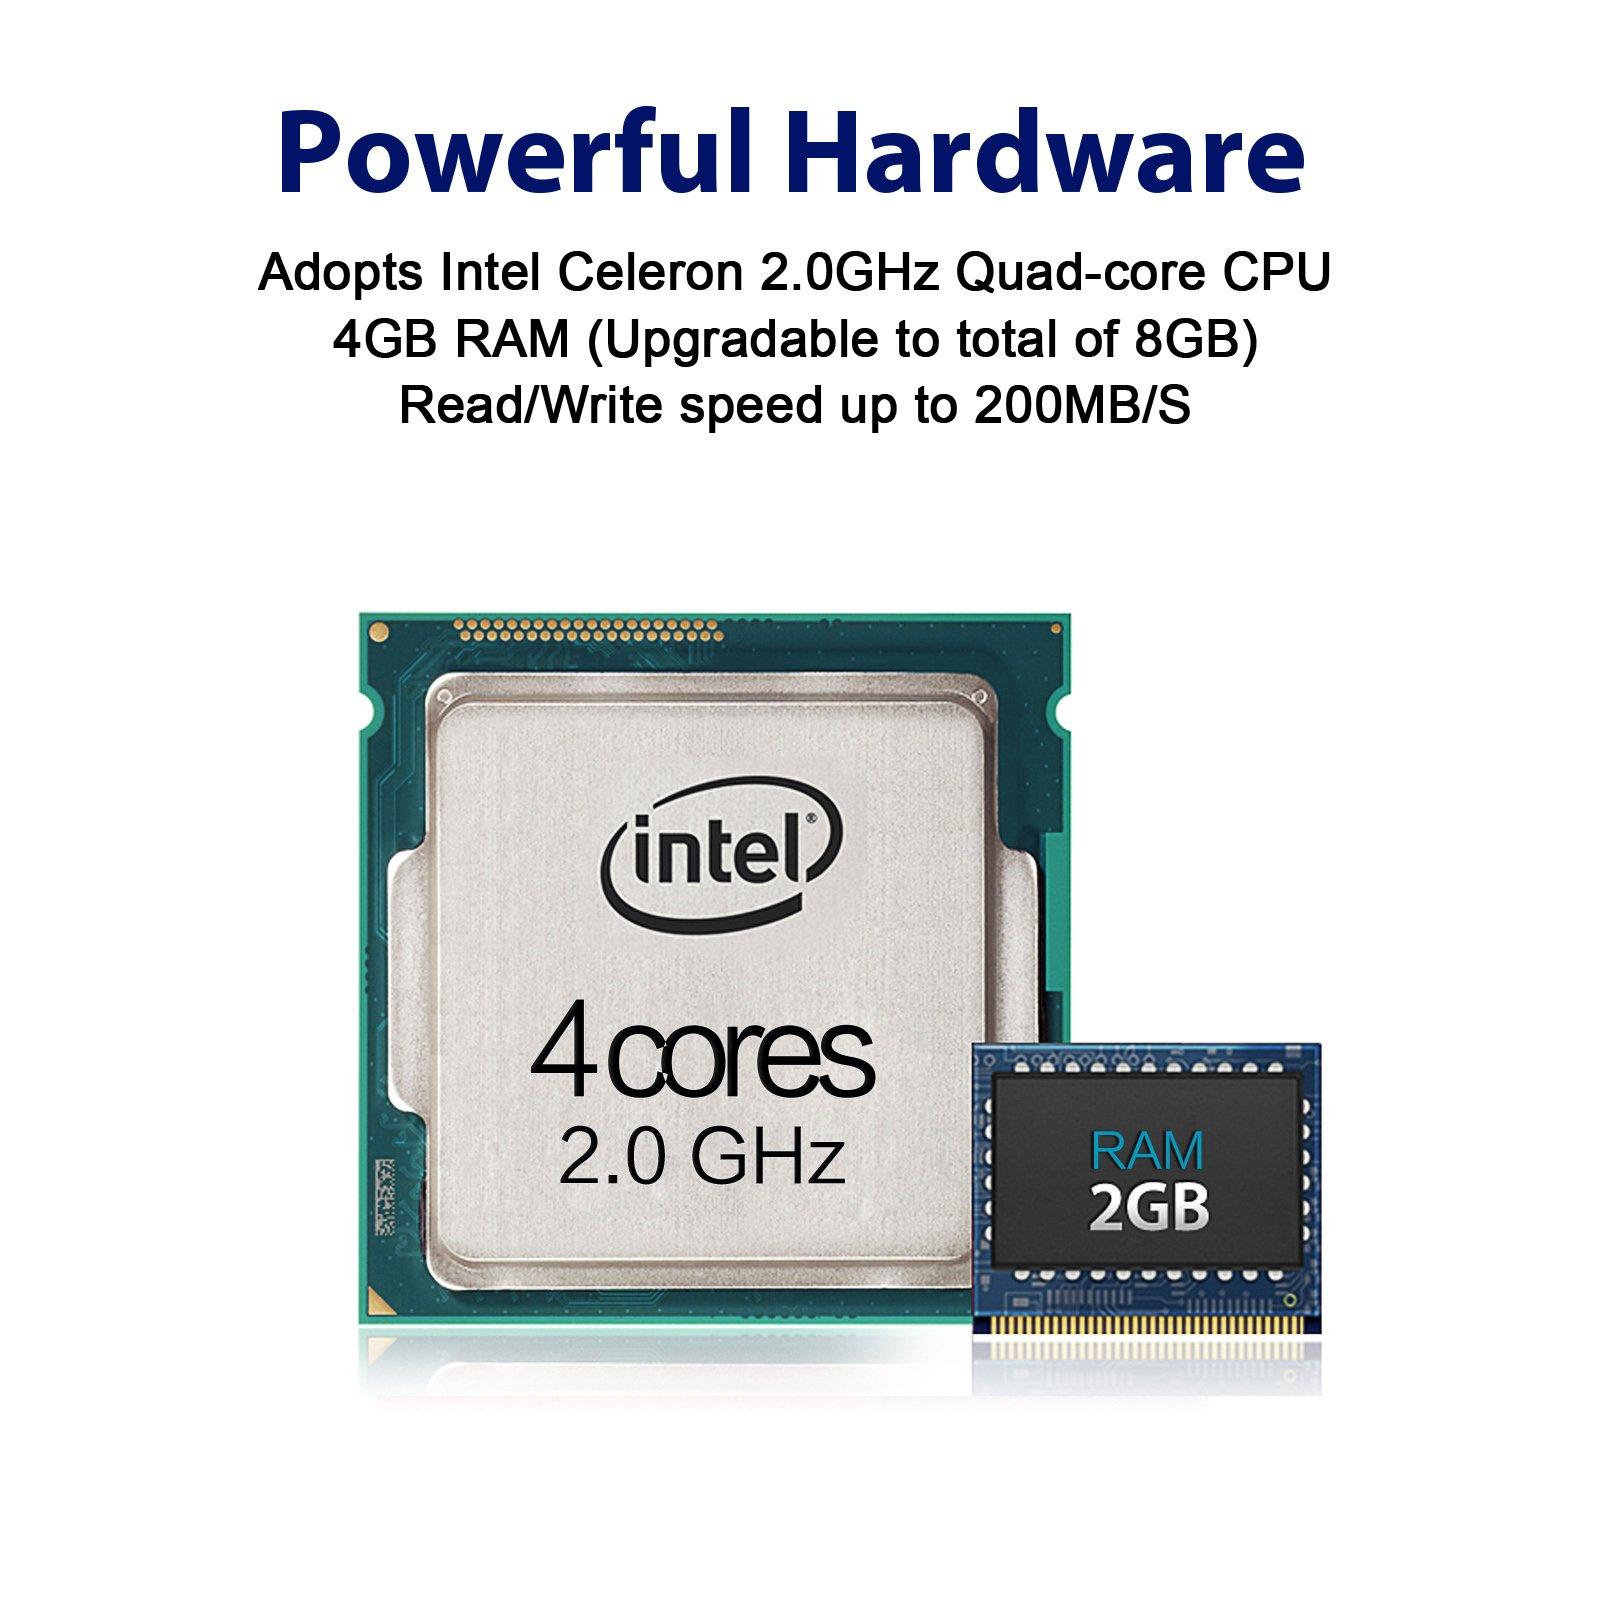 TerraMaster F2-420 NAS Server 2-Bay Intel Quad Core 2.0GHz 4GB RAM Network RAID Storage for Small/Medium Business (Diskless) by TerraMaster (Image #4)